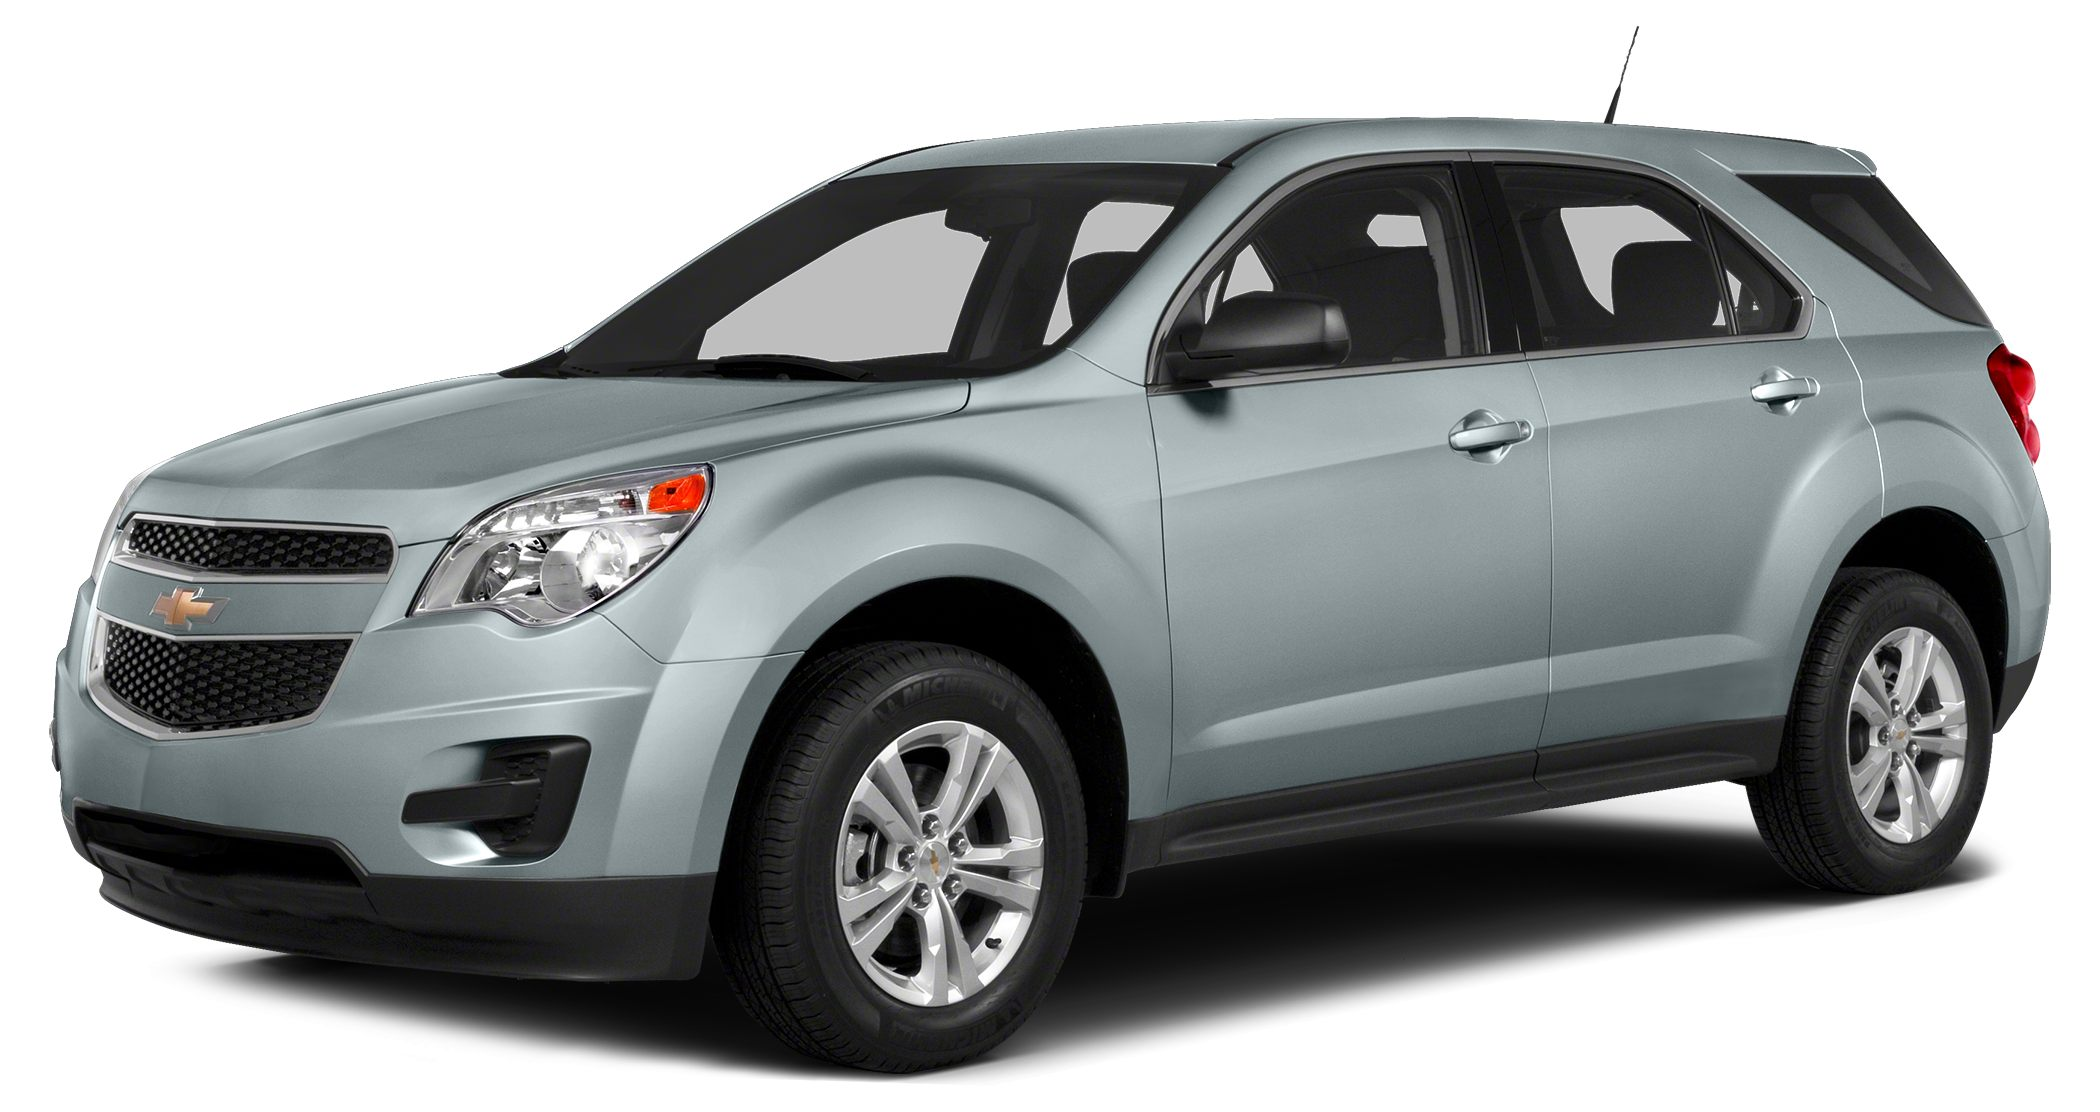 2015 Chevrolet Equinox LS Price includes 750 - General Motors Bonus Cash Program Exp 0102 1